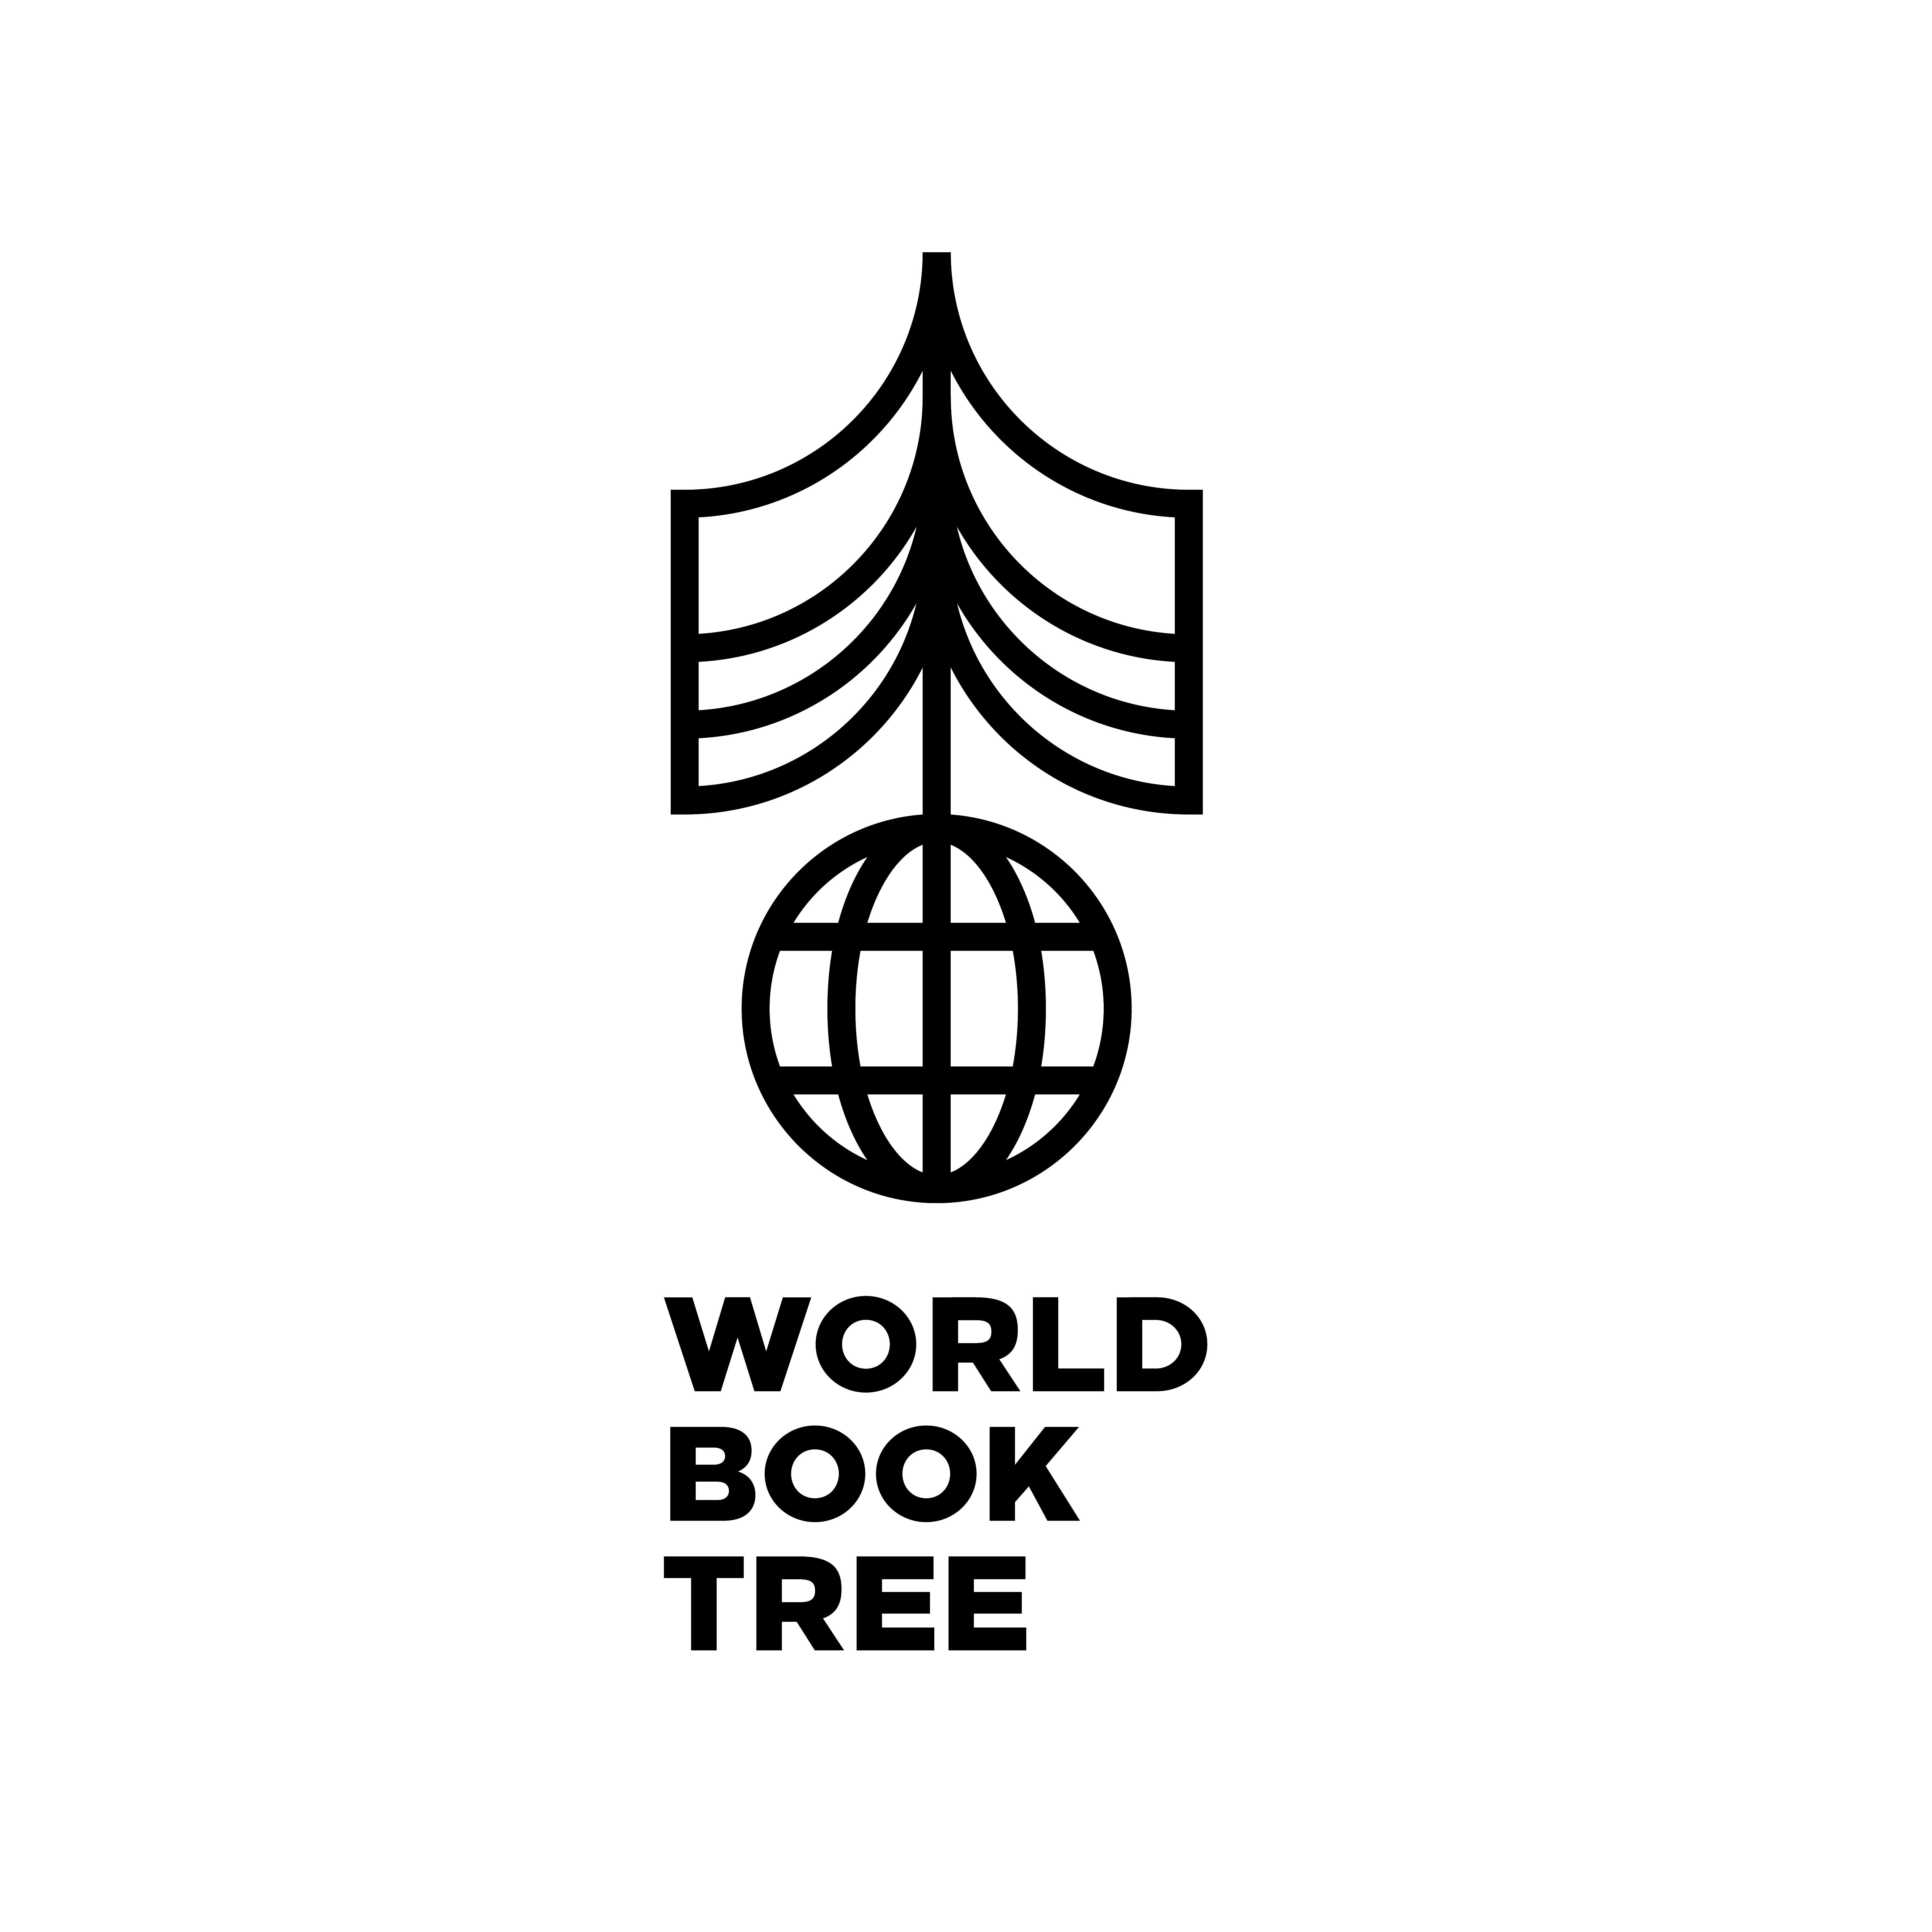 World Book Tree